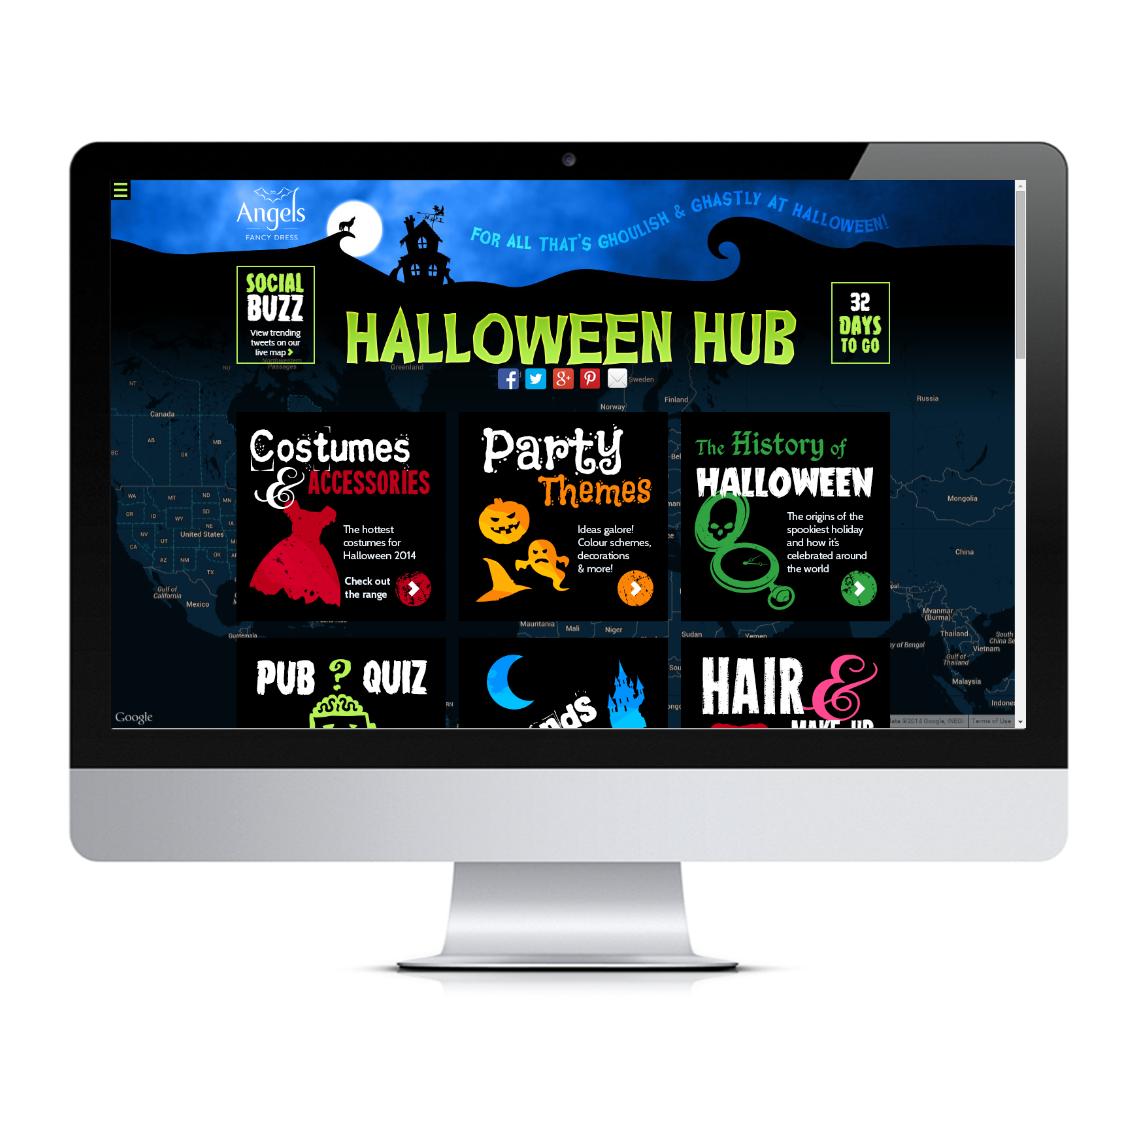 Halloween Hub home